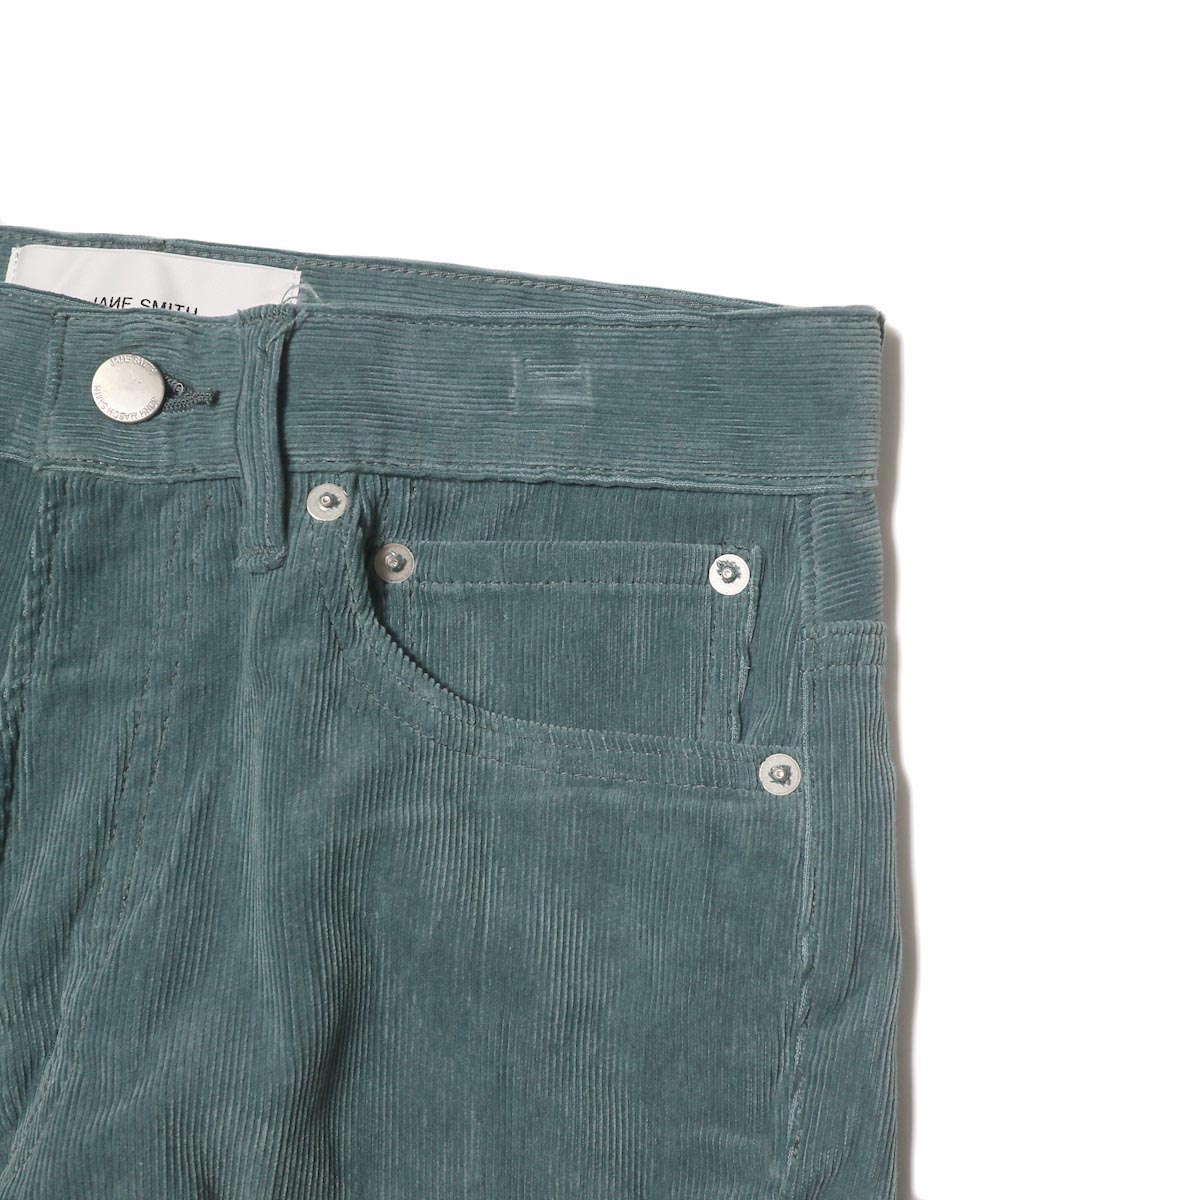 JANE SMITH / 5POCKET BOOTSCUT (jade green) チェンジポケット